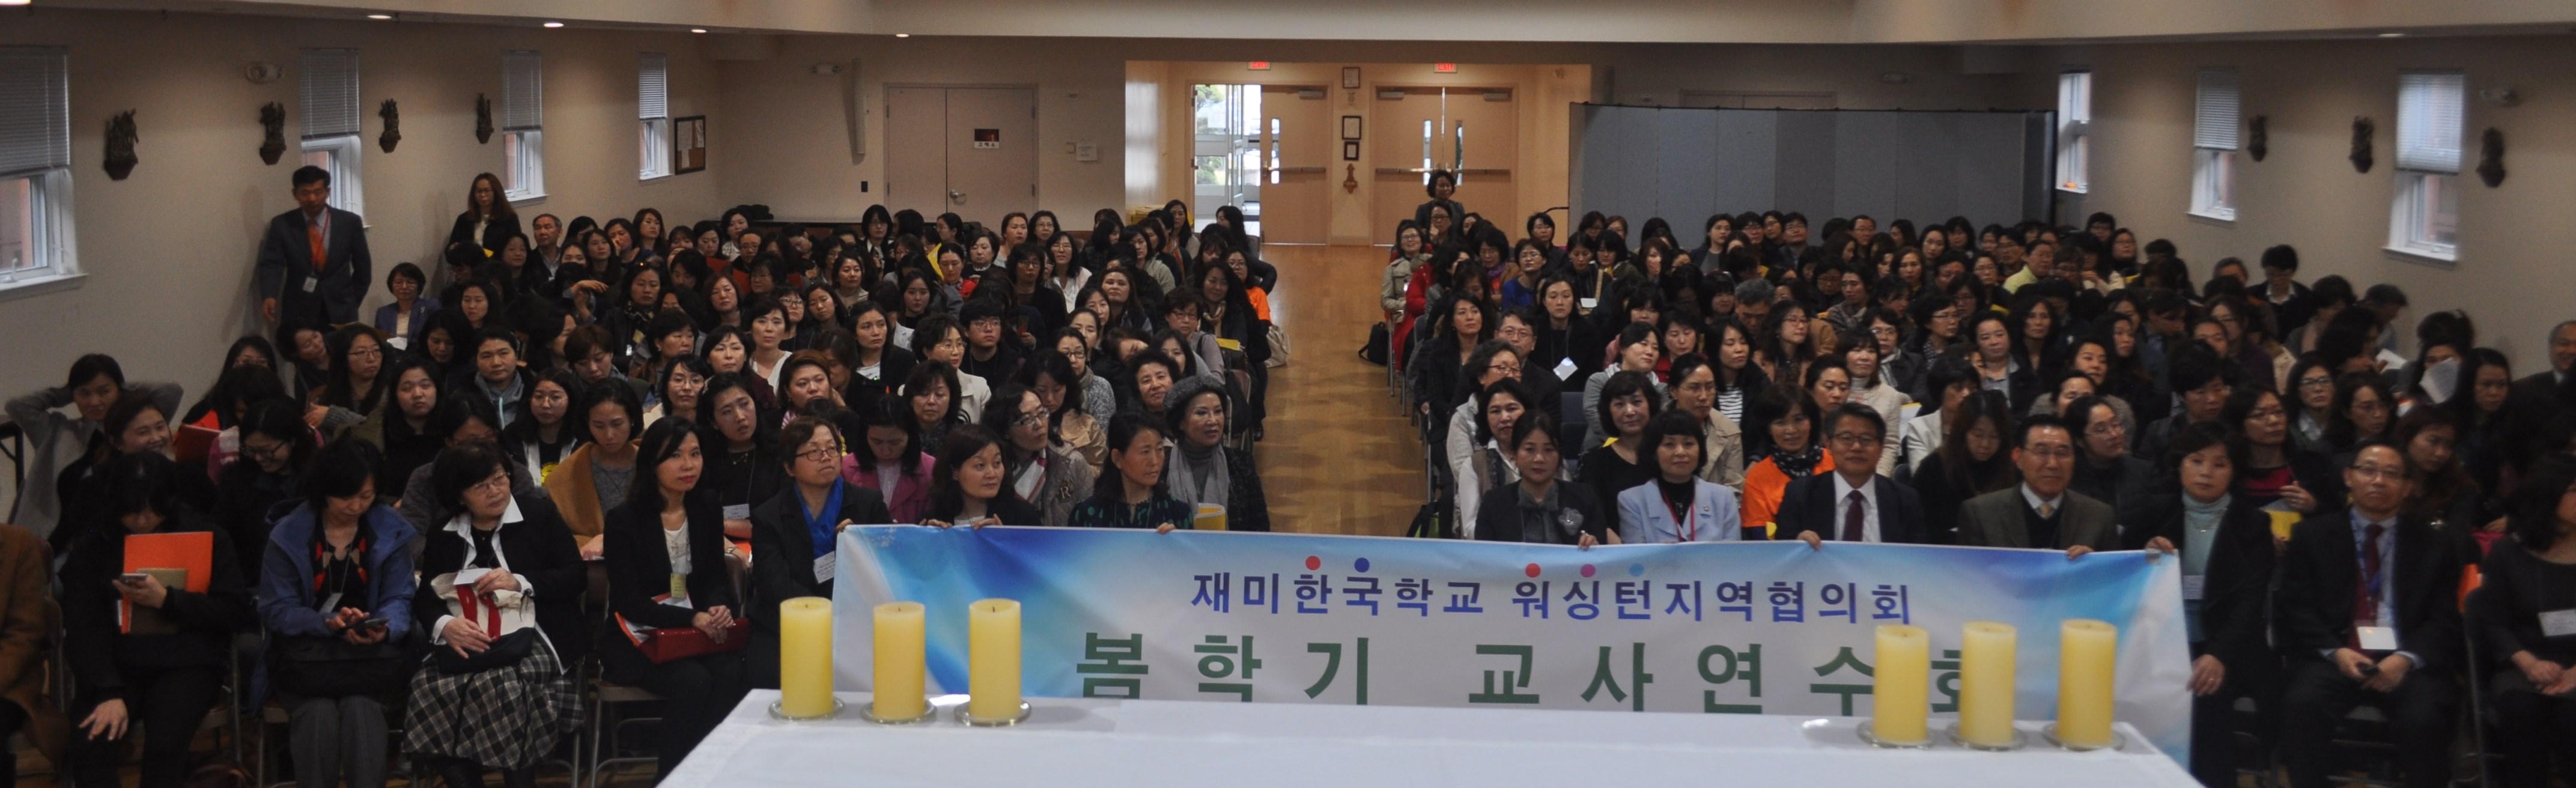 (20180224) WAKS 교사연수회 전체 사진.JPG